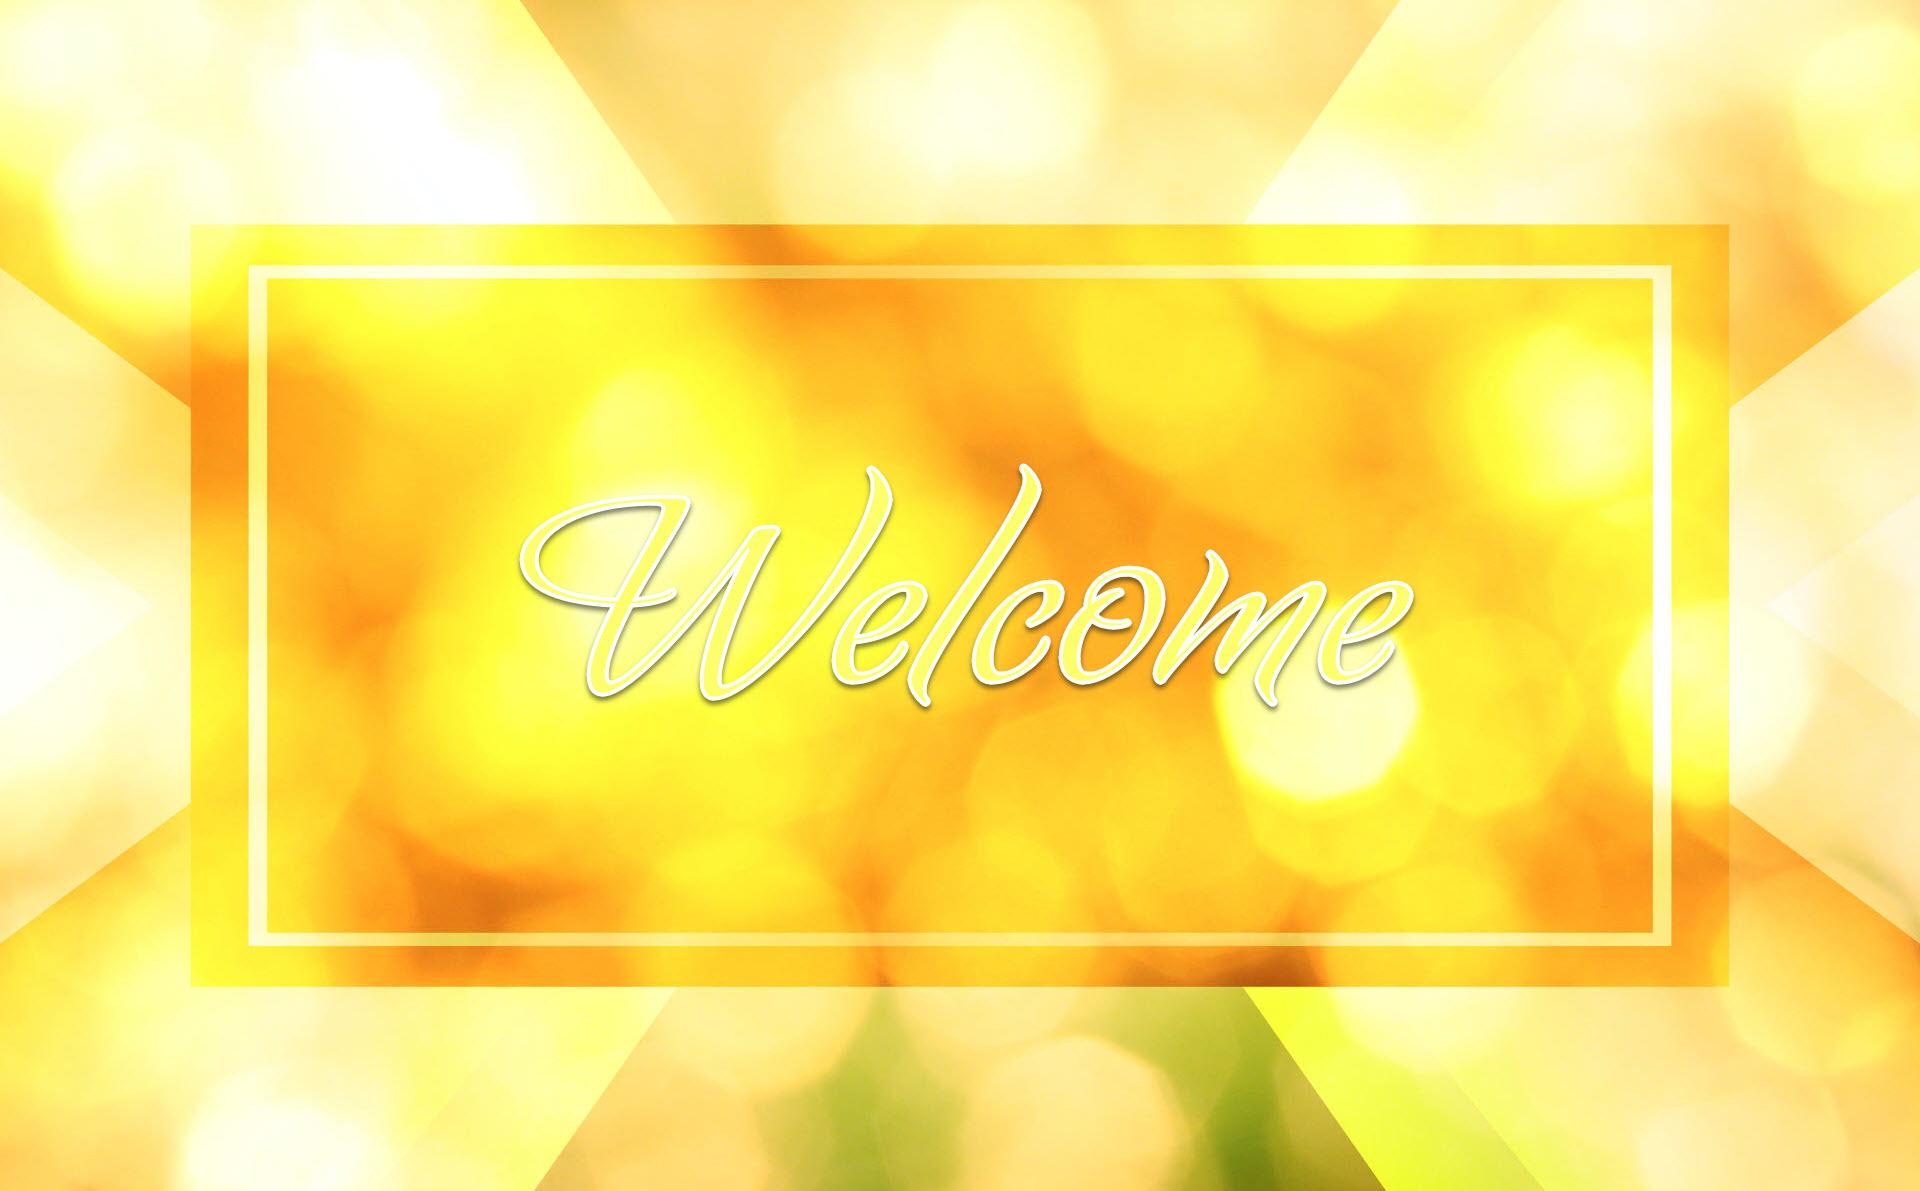 Nền Powerpoint welcome mở đầu đẹp